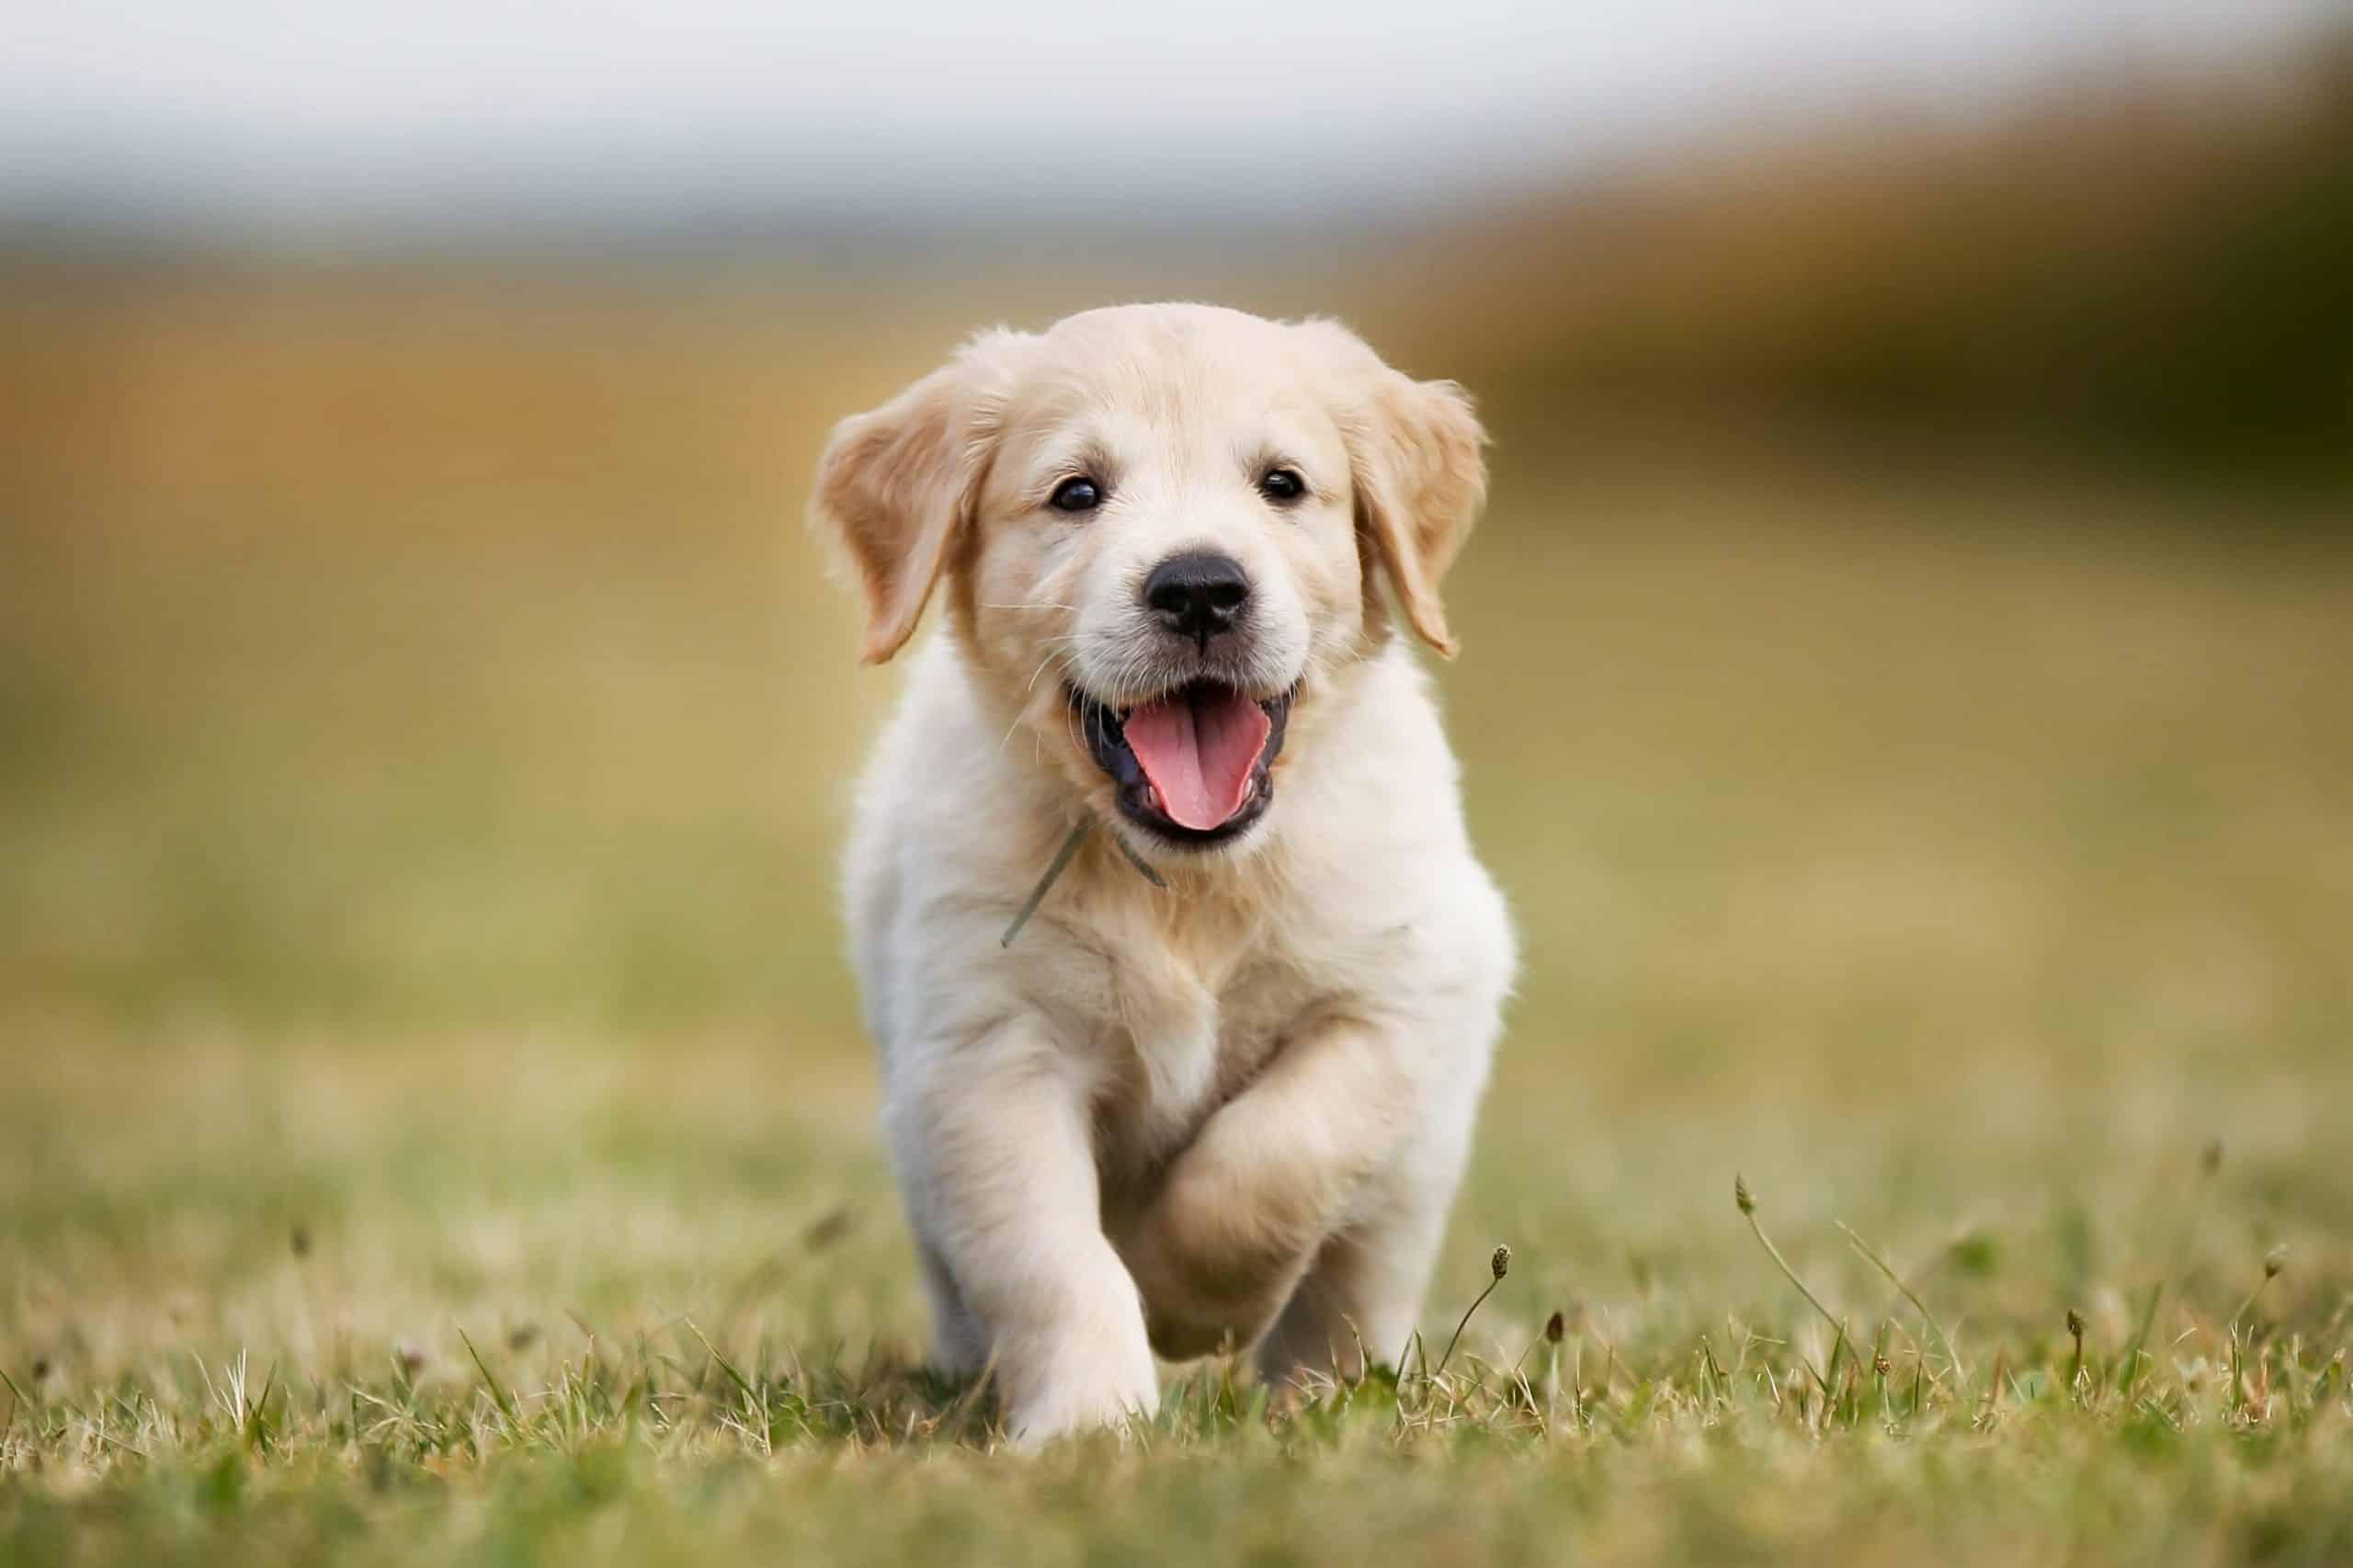 Cute Golden retriever puppy running free - early spay neuter when should I spay or neuter my Golden Retriever?